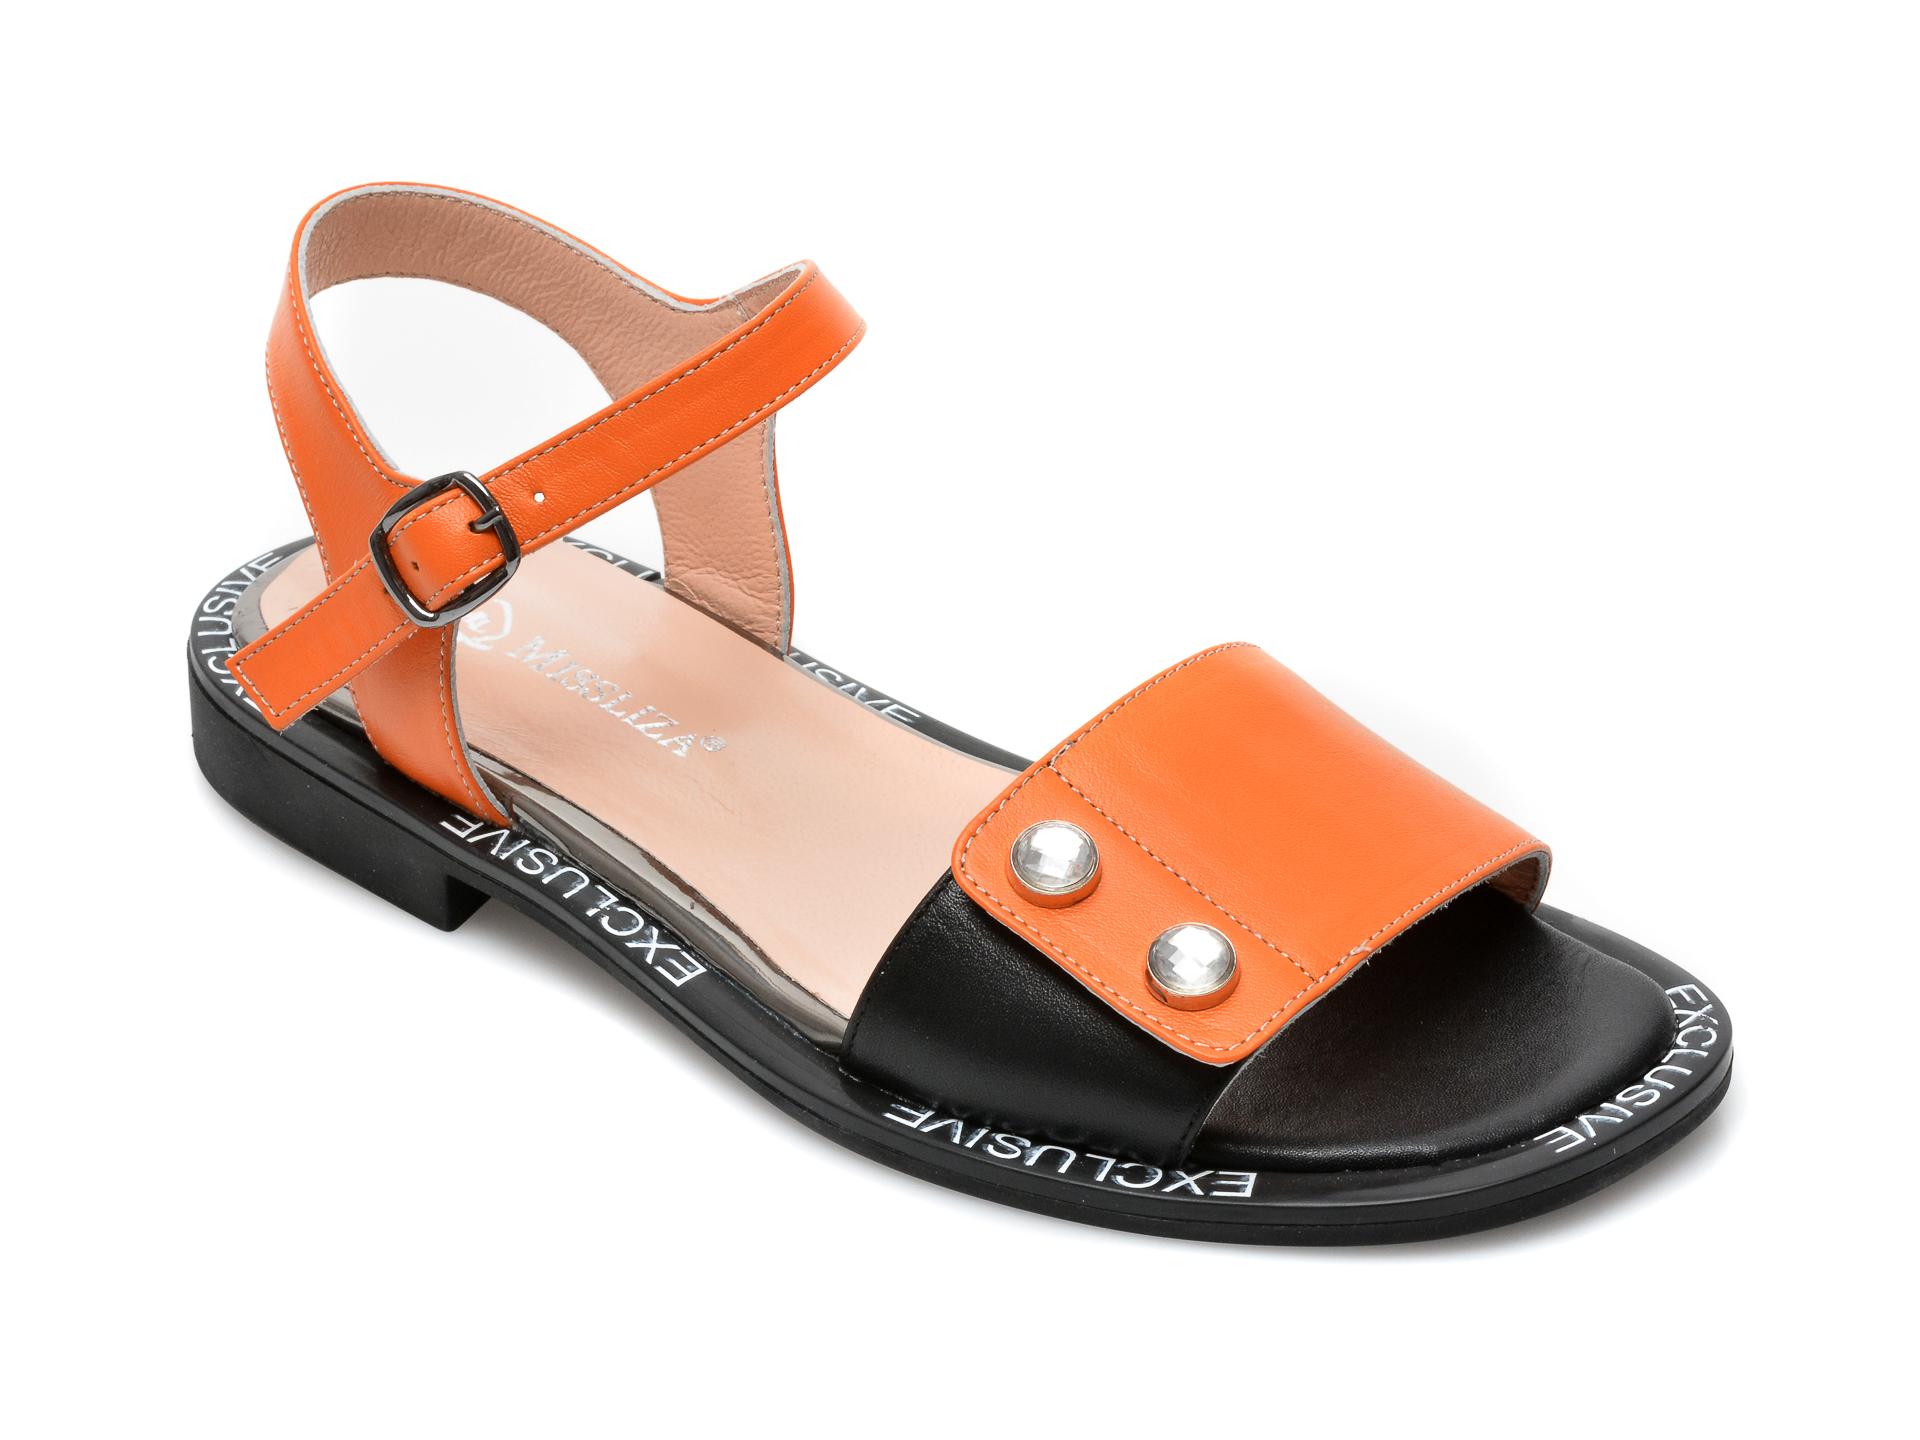 Sandale MISS LIZA portocalii, 2493, din piele naturala imagine otter.ro 2021